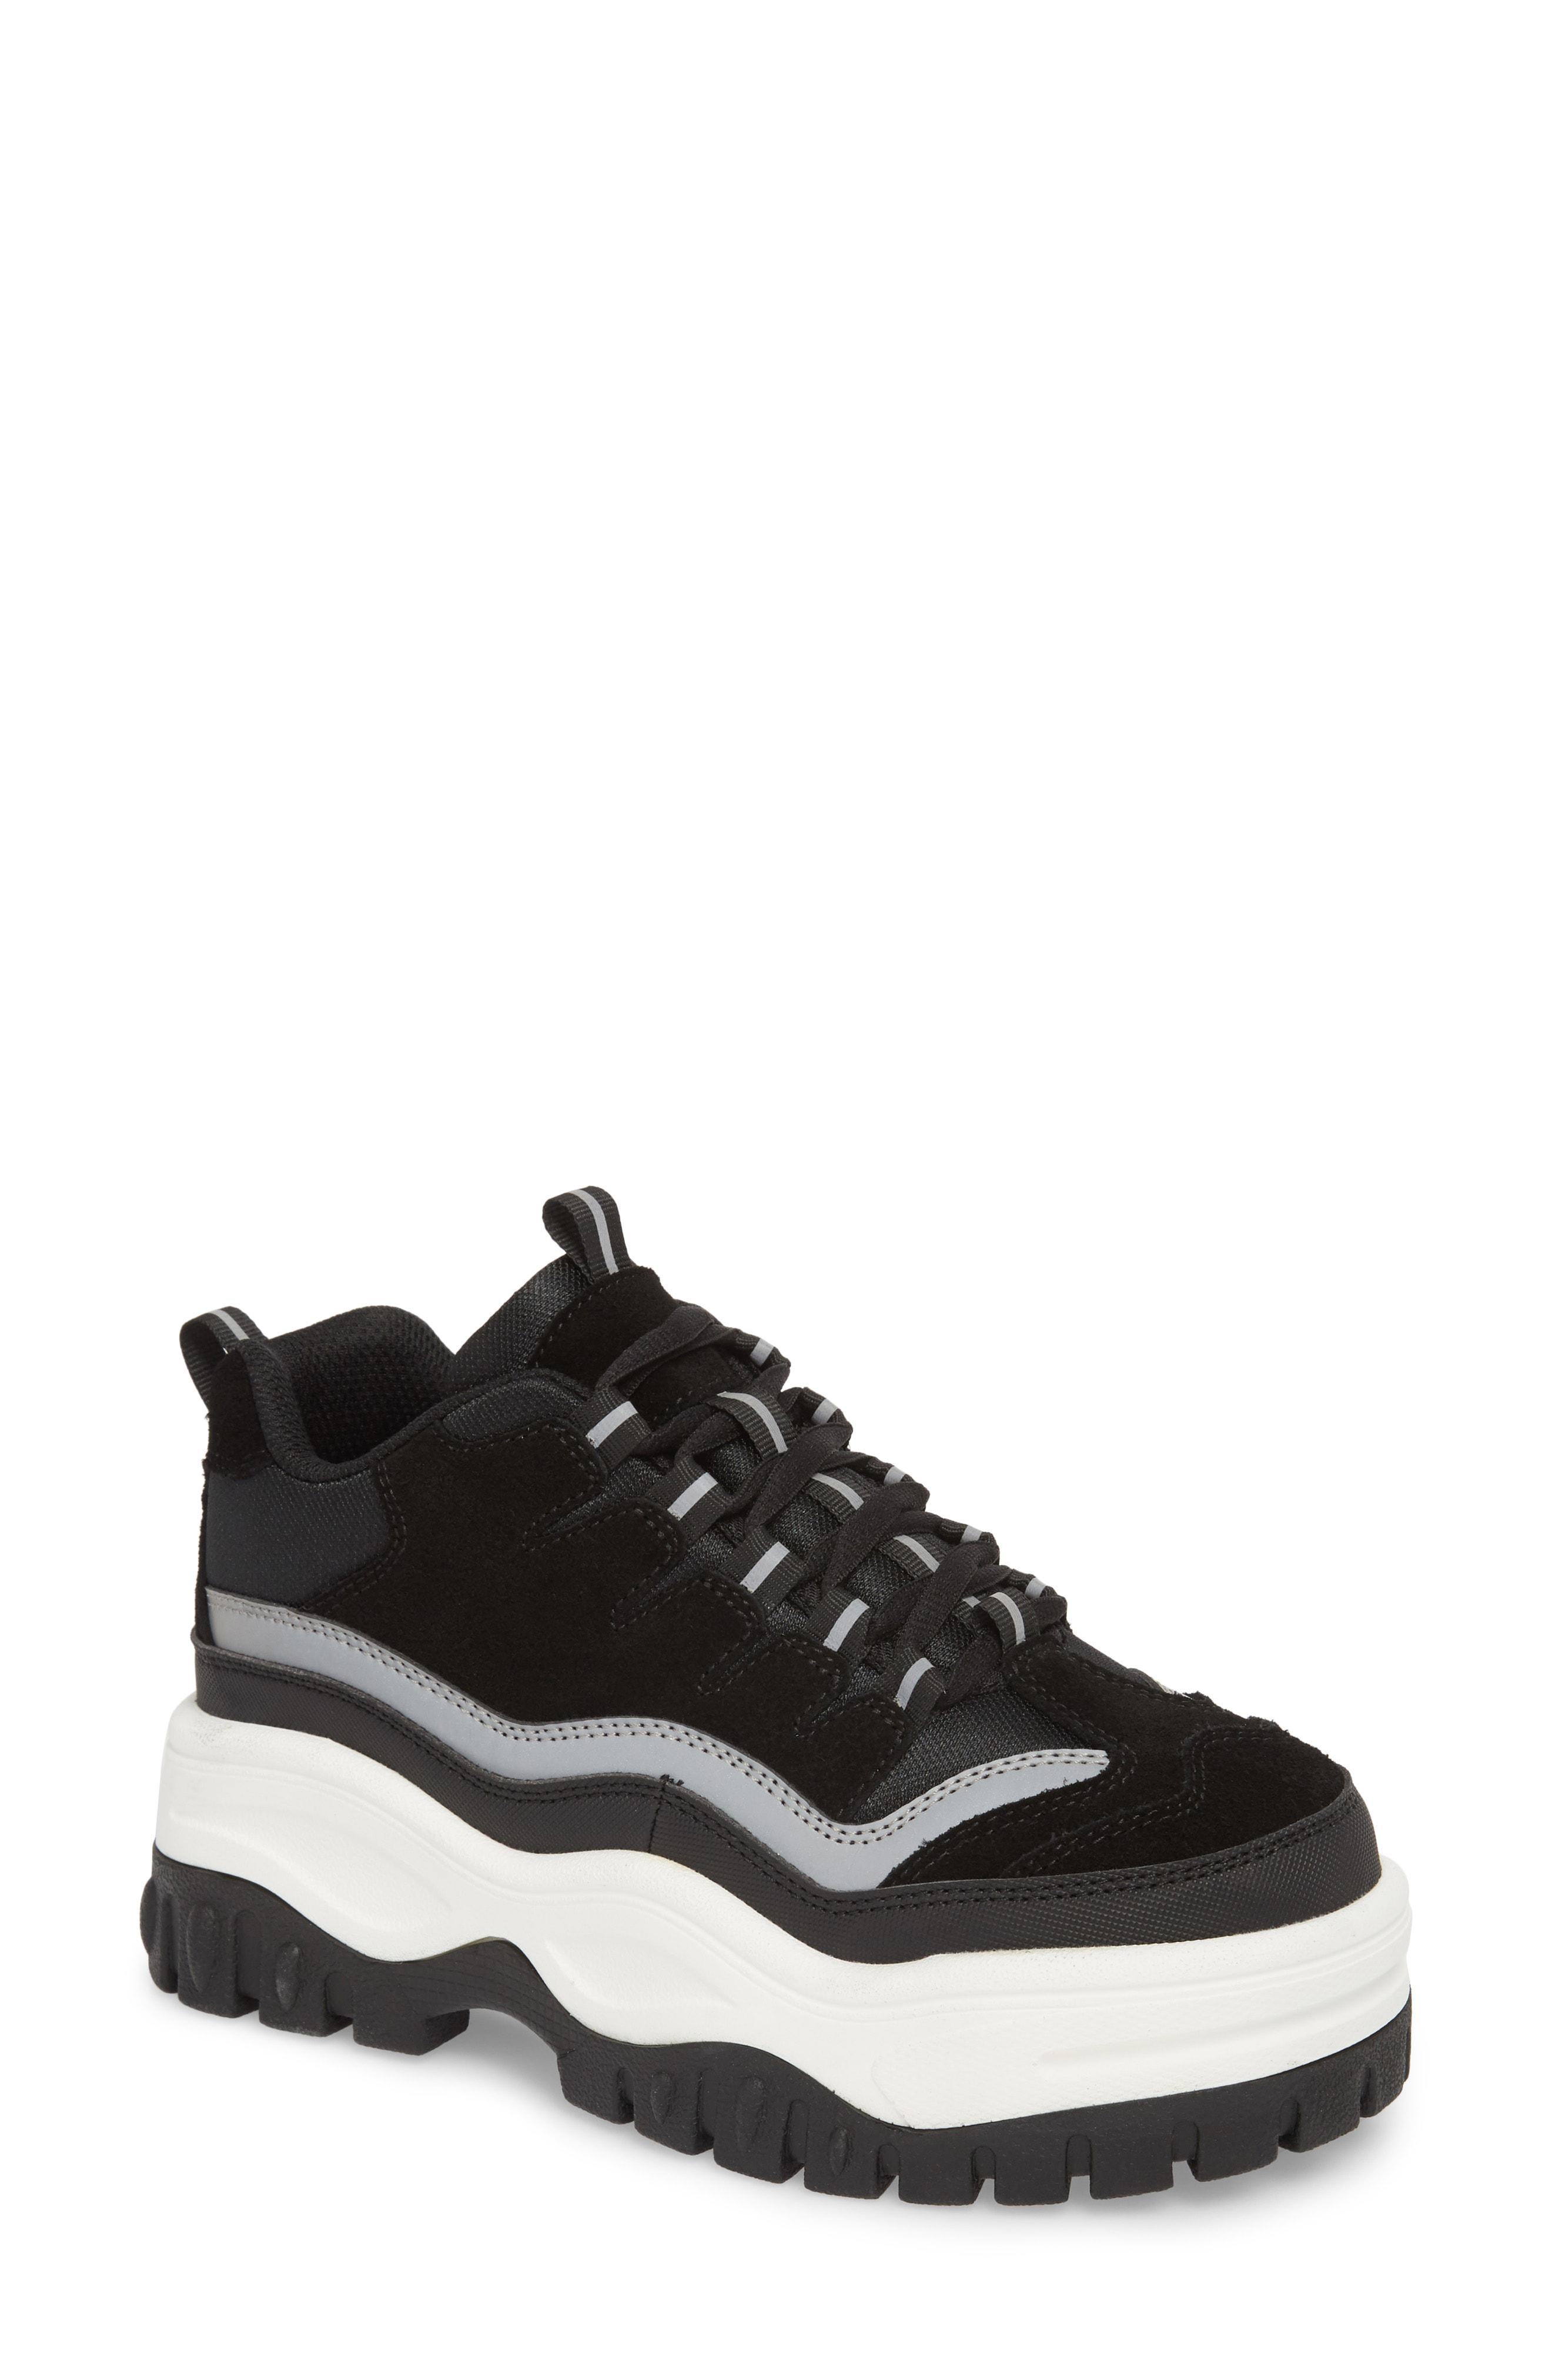 Jeffrey Campbell Pro Era Sneakers in